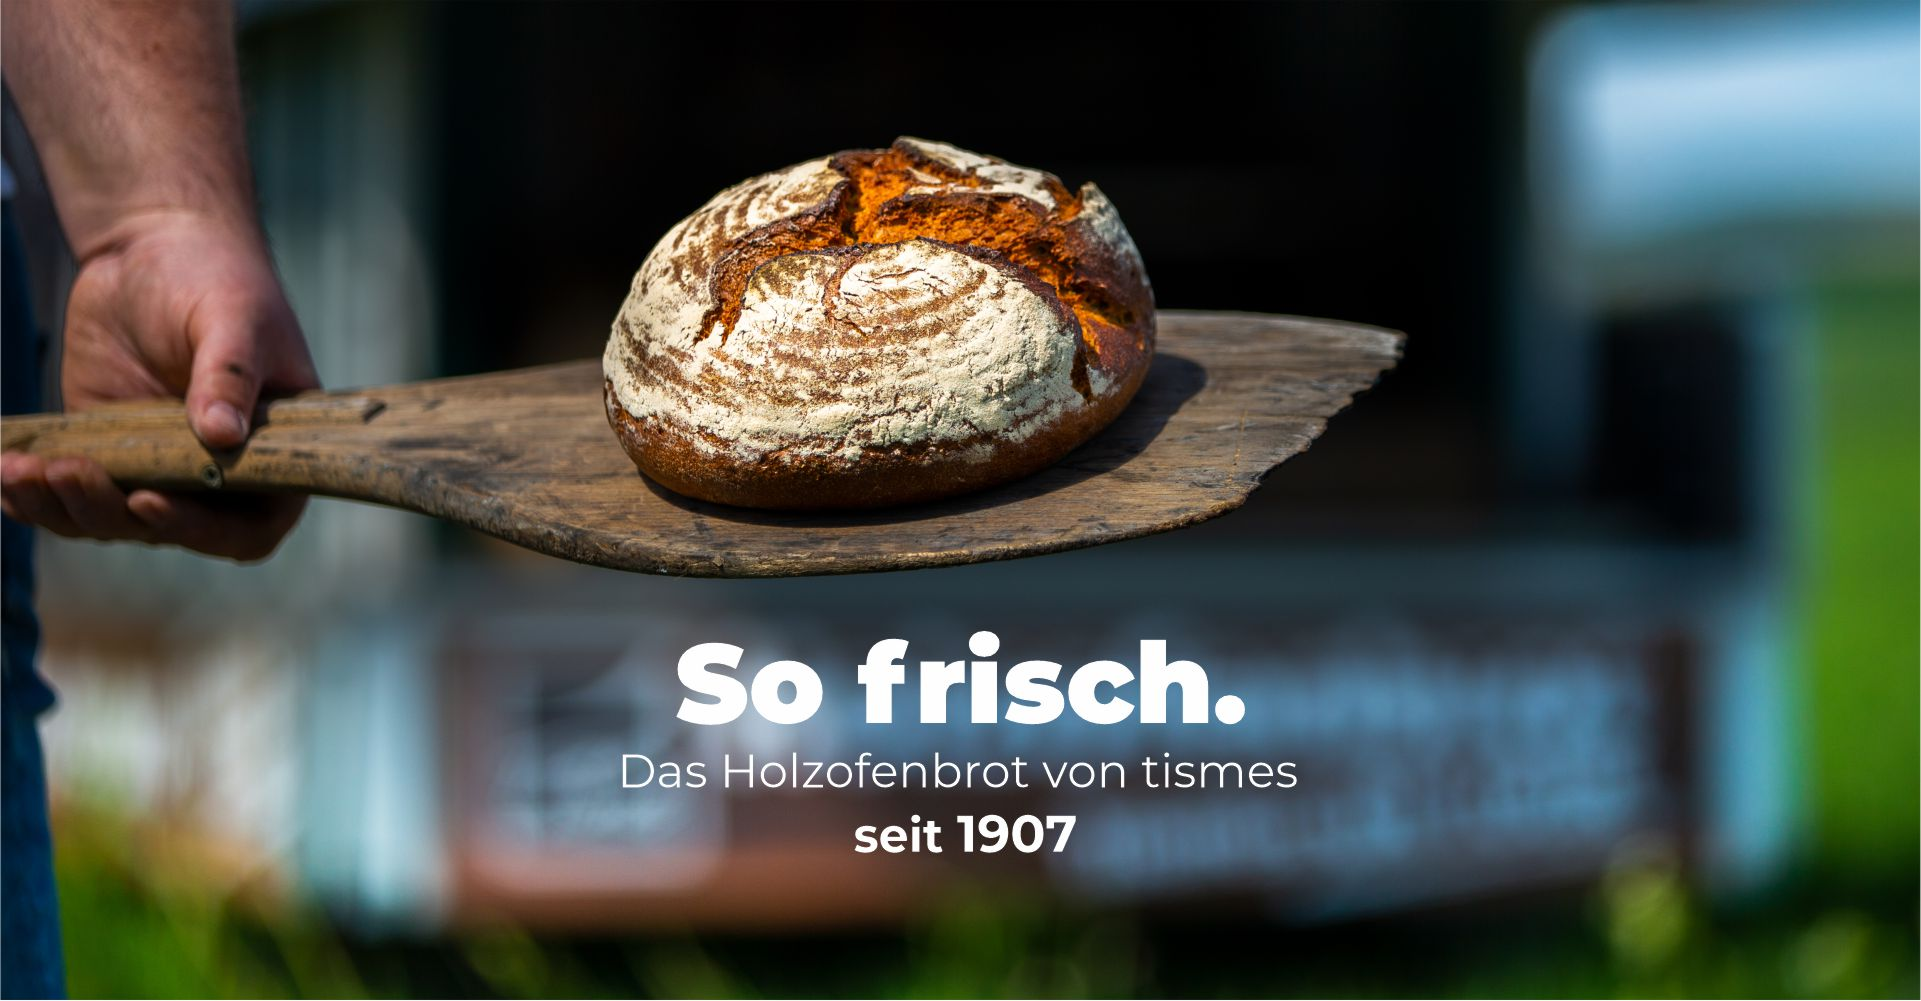 tismes_holzofen_slider_002